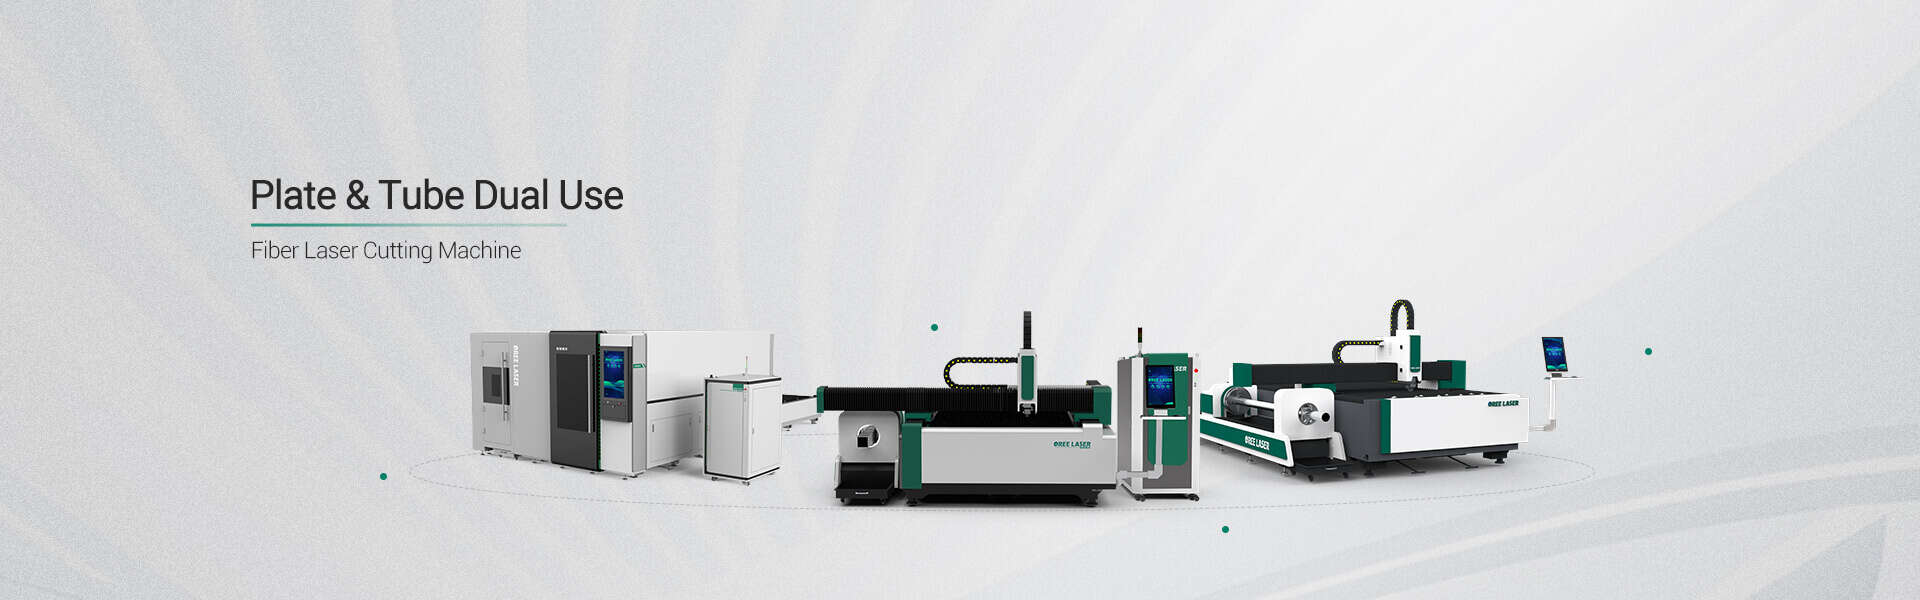 sheet and tubes laser cutting machine